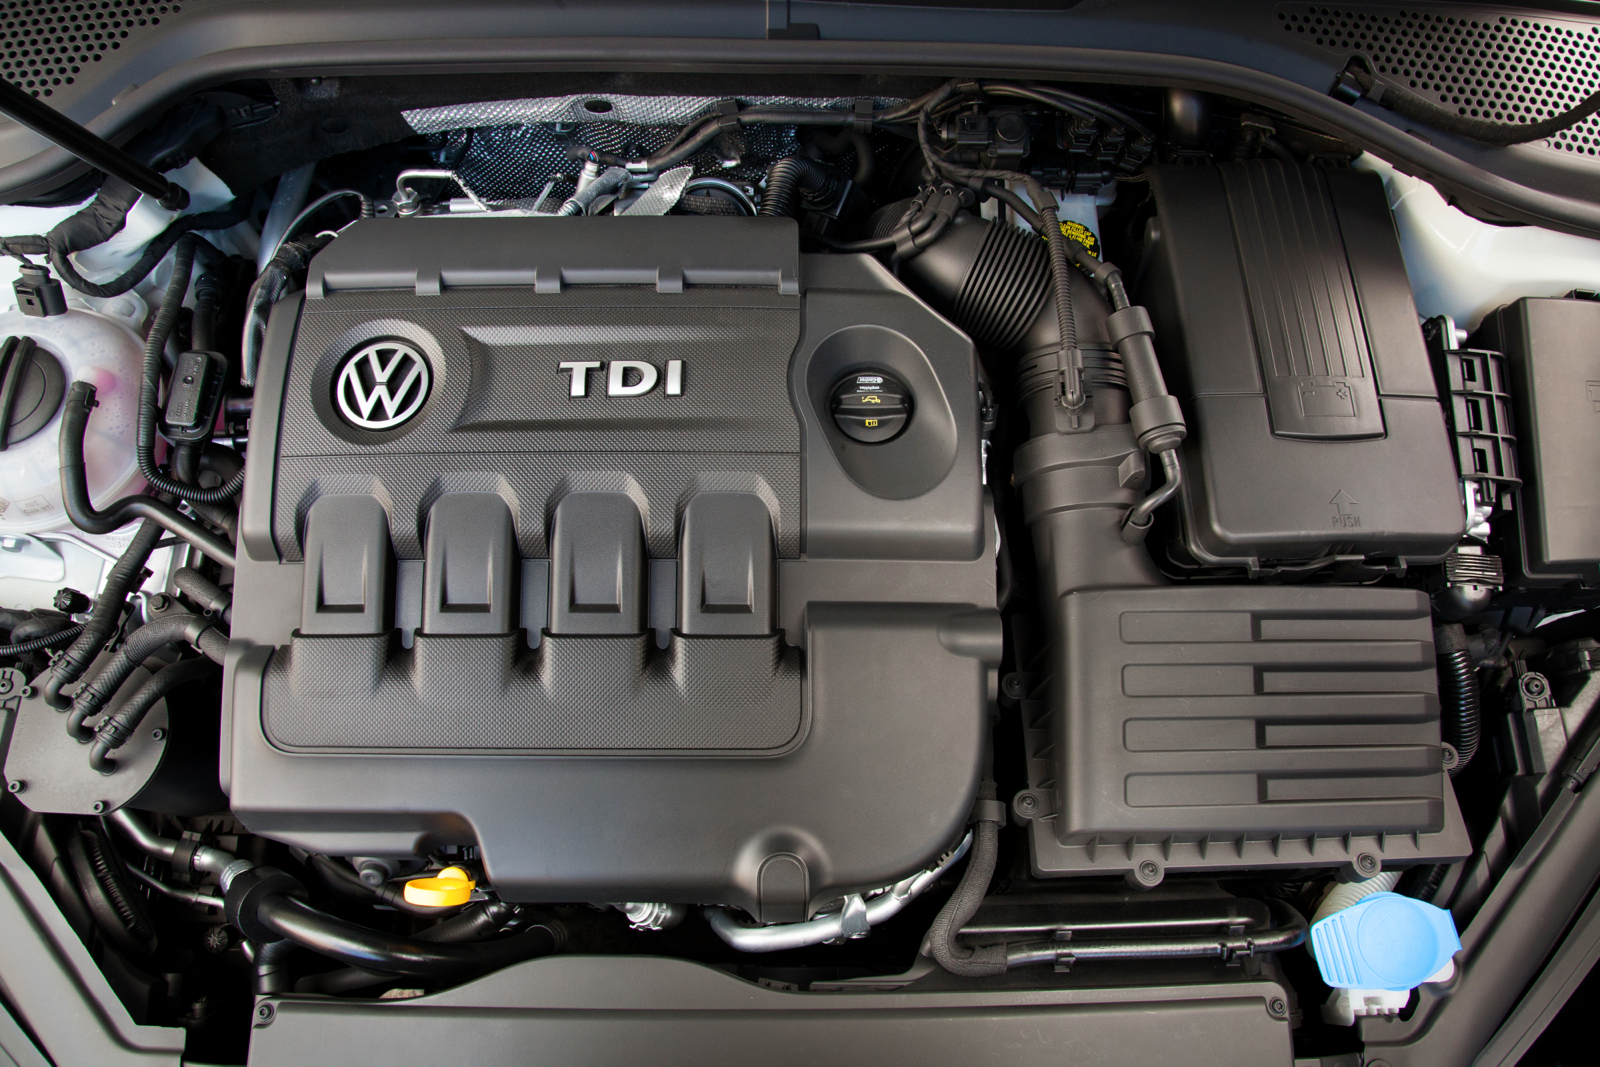 aa60da343fc VW Diesel Cheating An  Open Secret  In Engine Group  Report